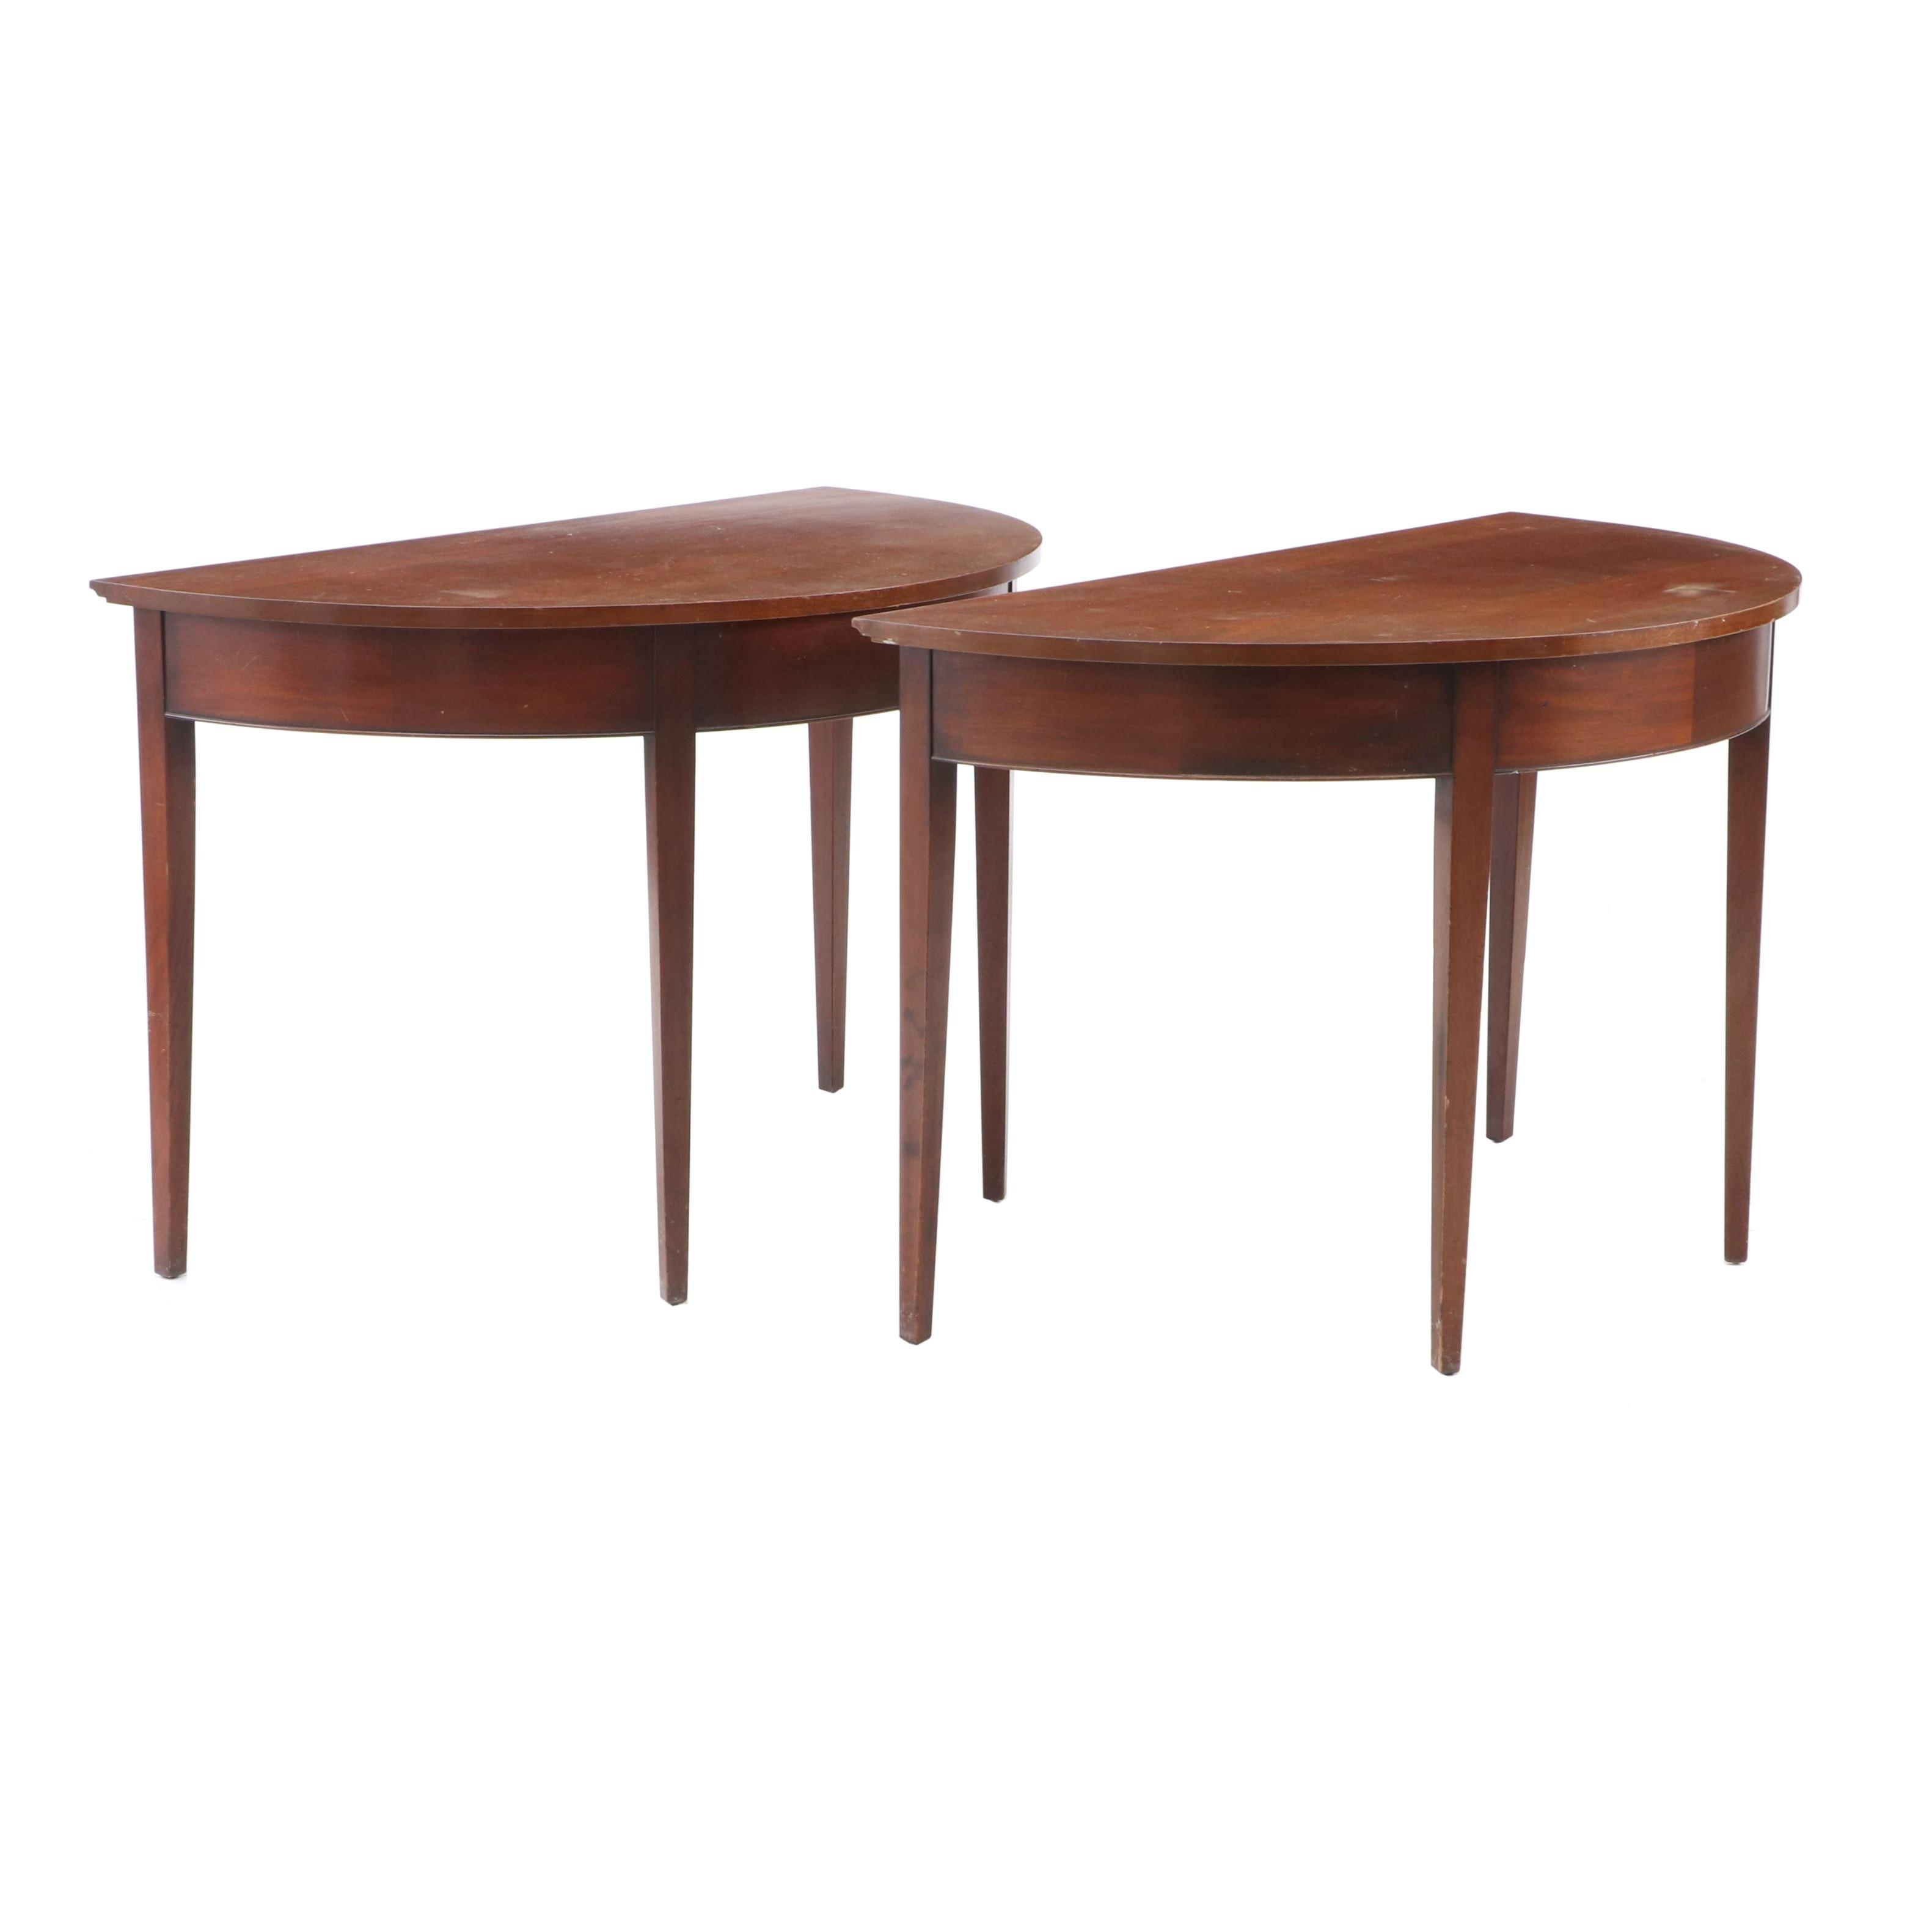 Federal Style Mahogany Veneer Demilune Tables, Mid-20th Century